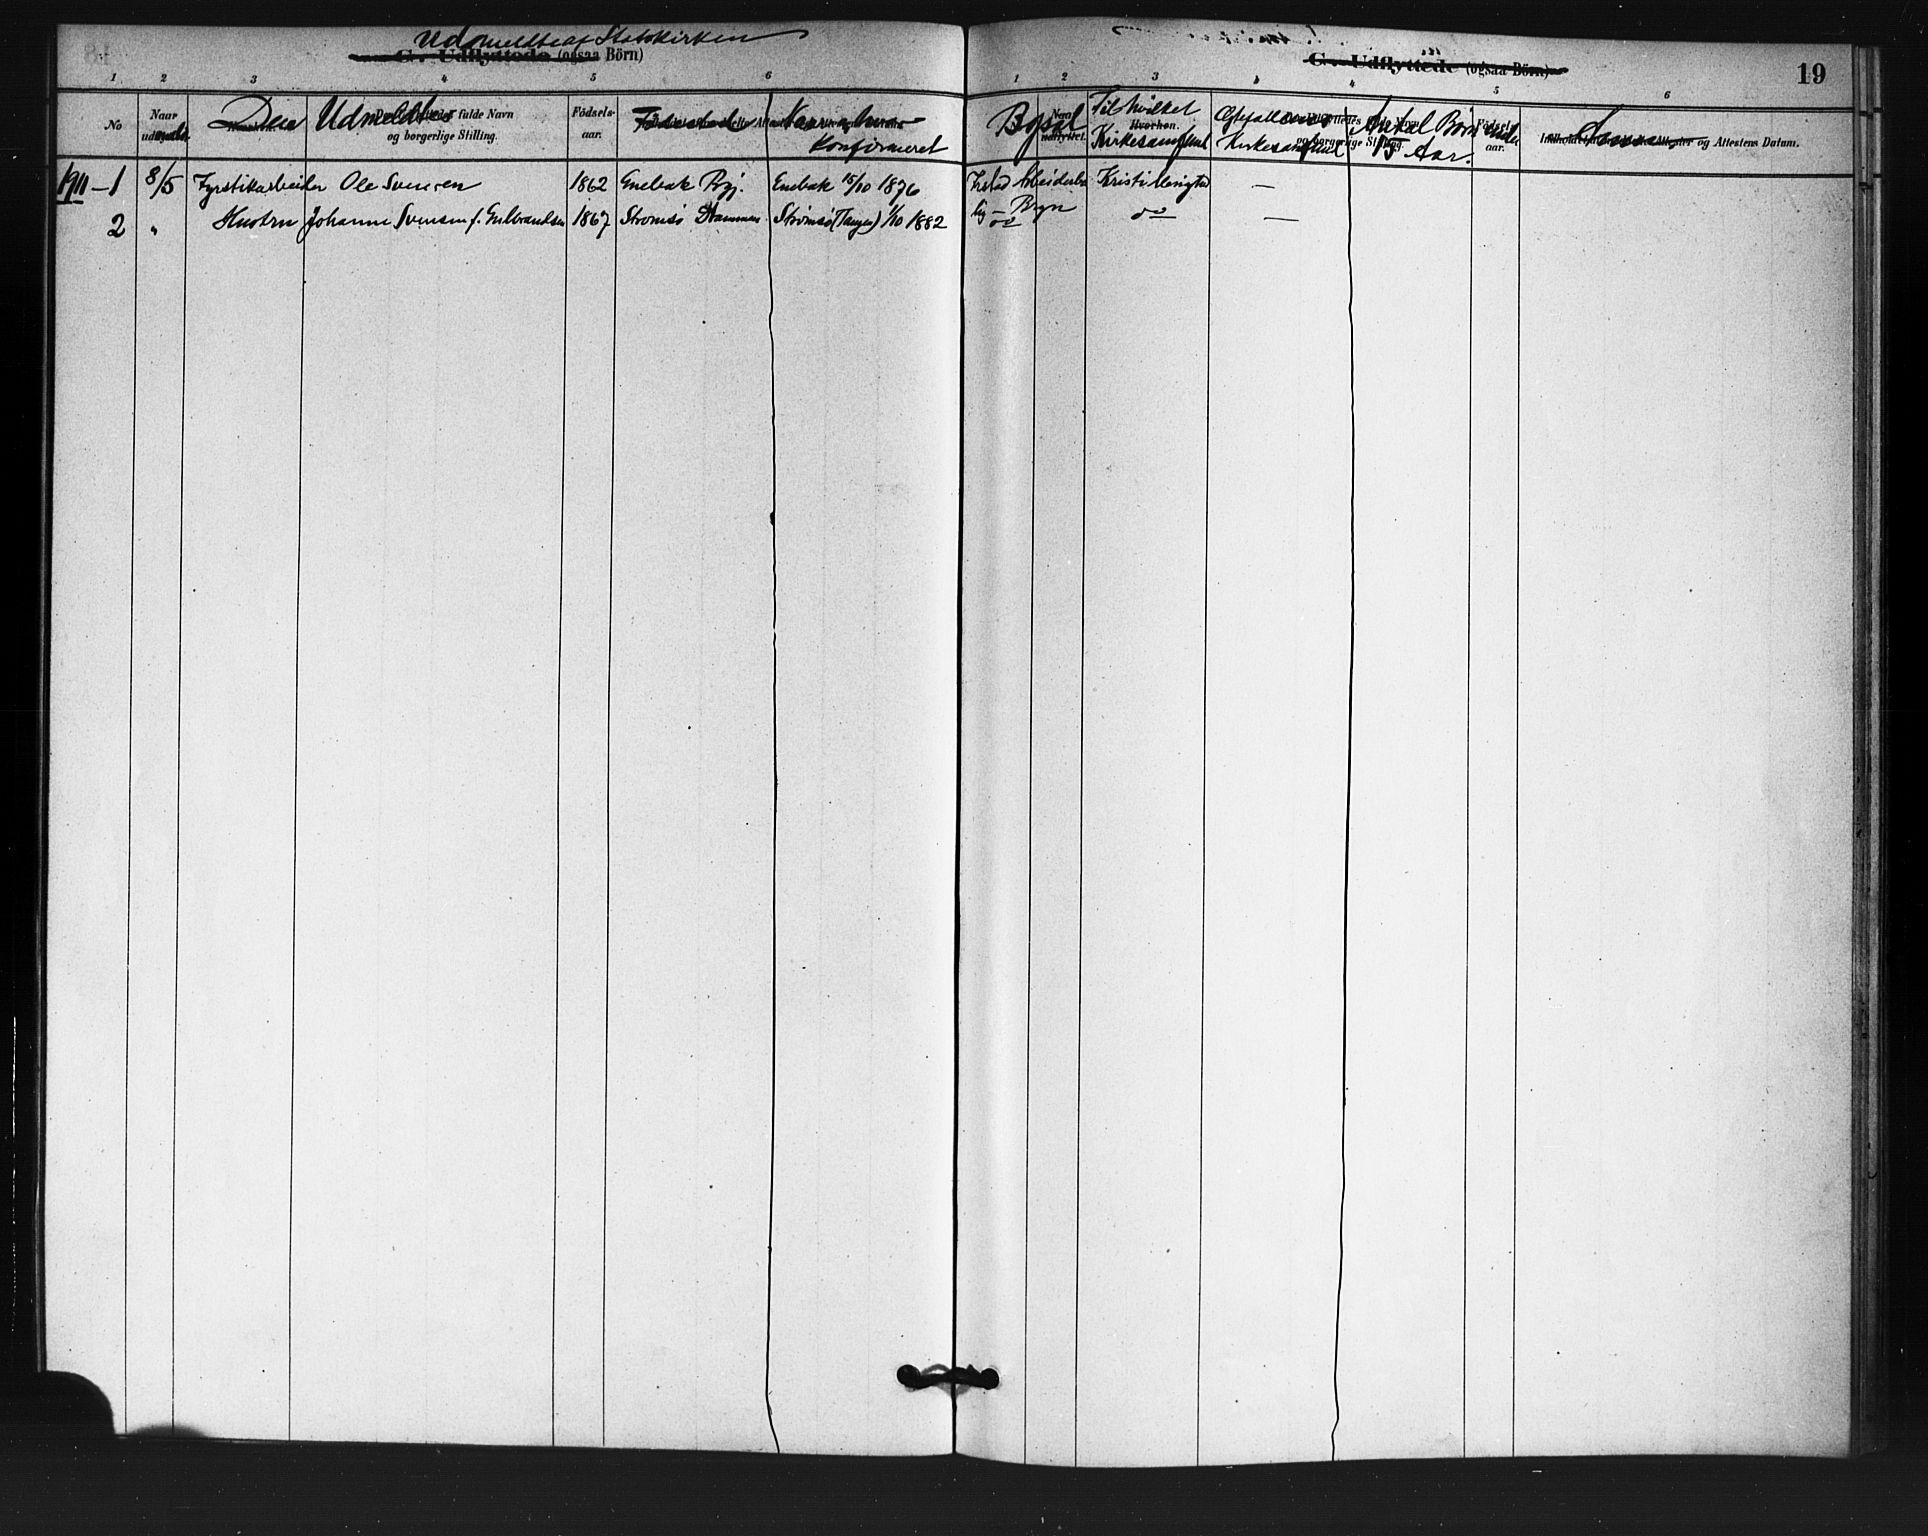 SAO, Østre Aker prestekontor Kirkebøker, F/Fa/L0007: Ministerialbok nr. I 7, 1879-1912, s. 19